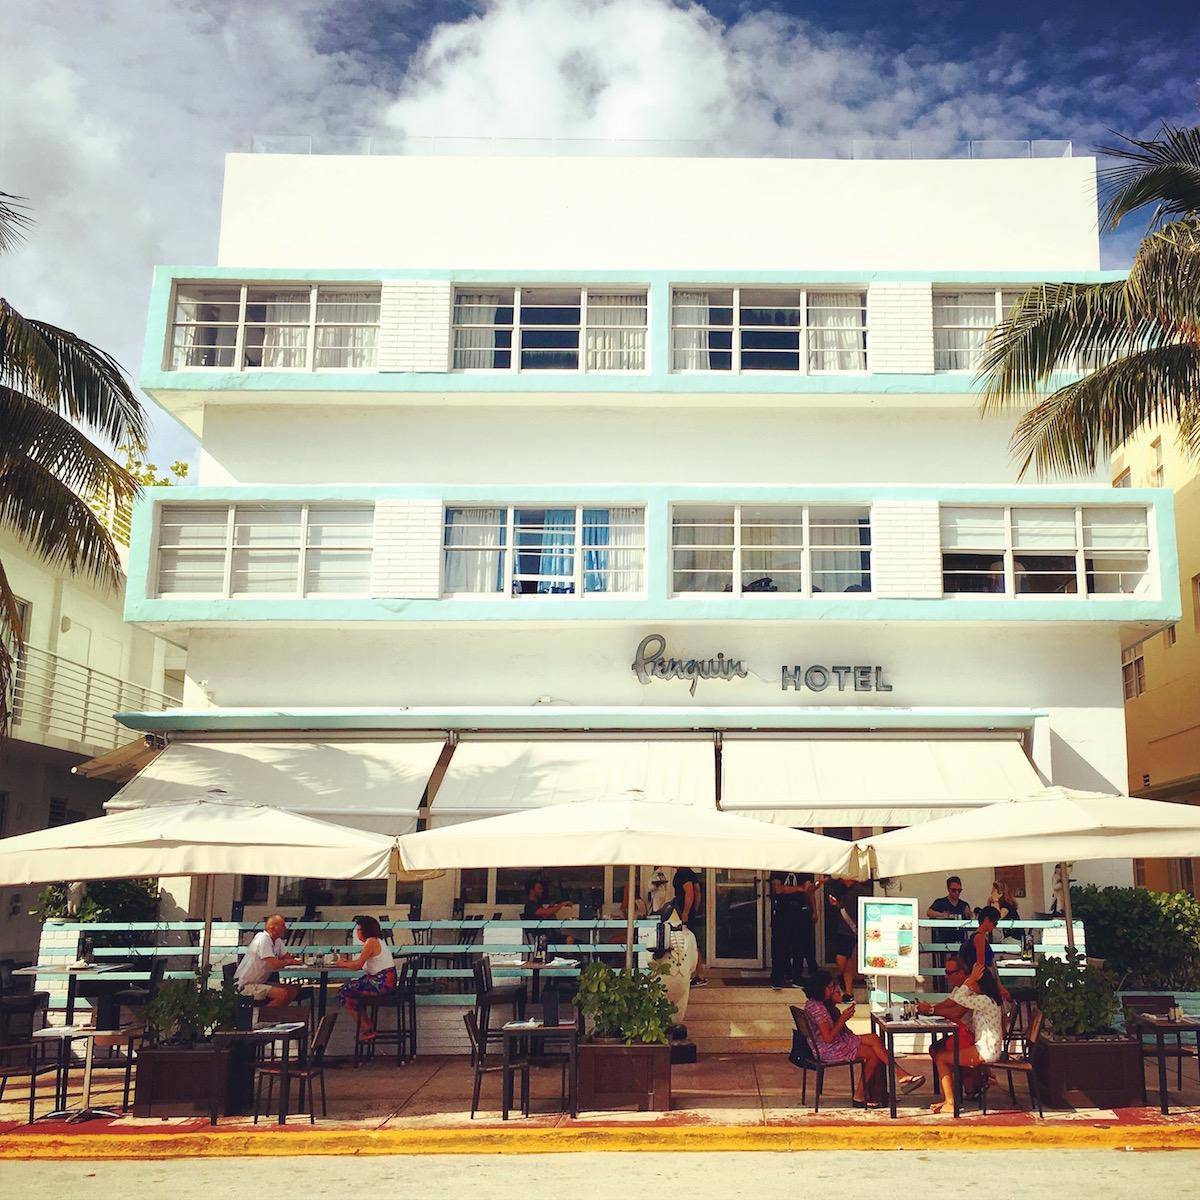 Miami Beach - Ocean Drive - Penguin Hotel